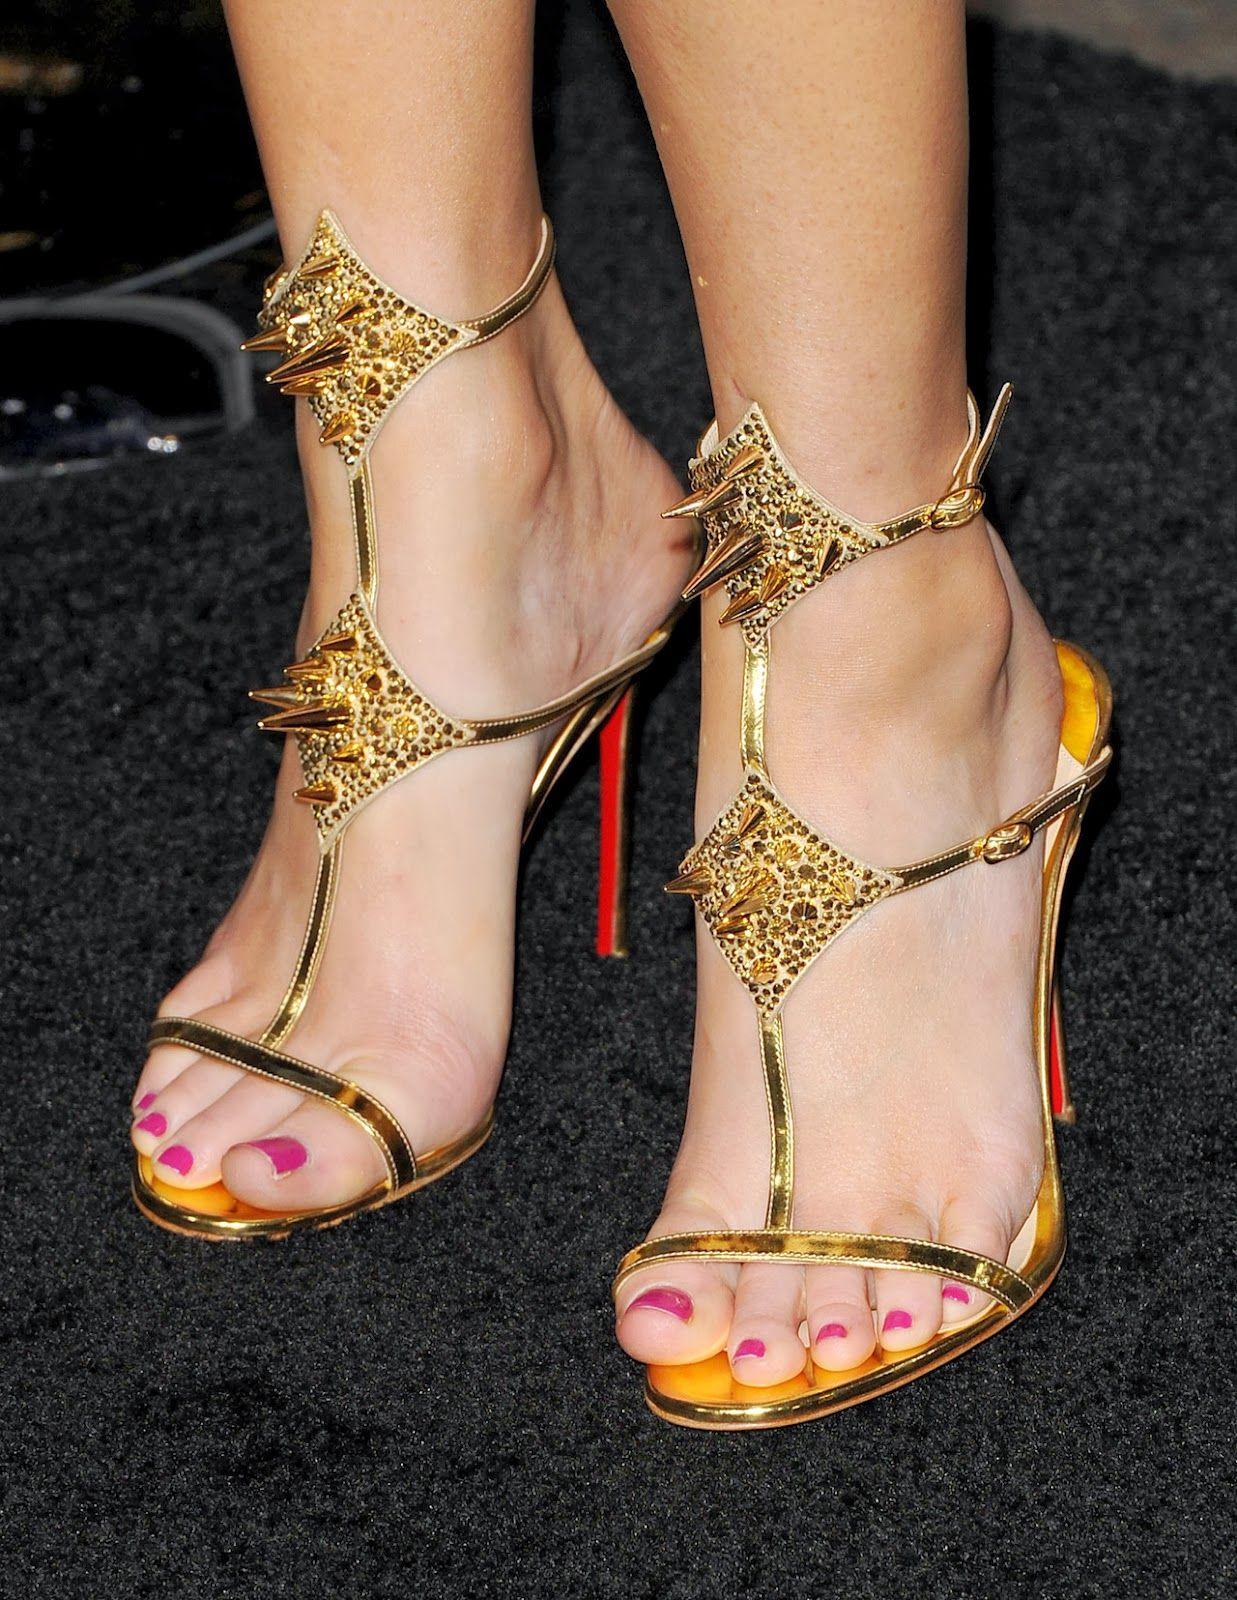 Fantásticos Zapatos de moda para la mujer de hoy | Moda 2014